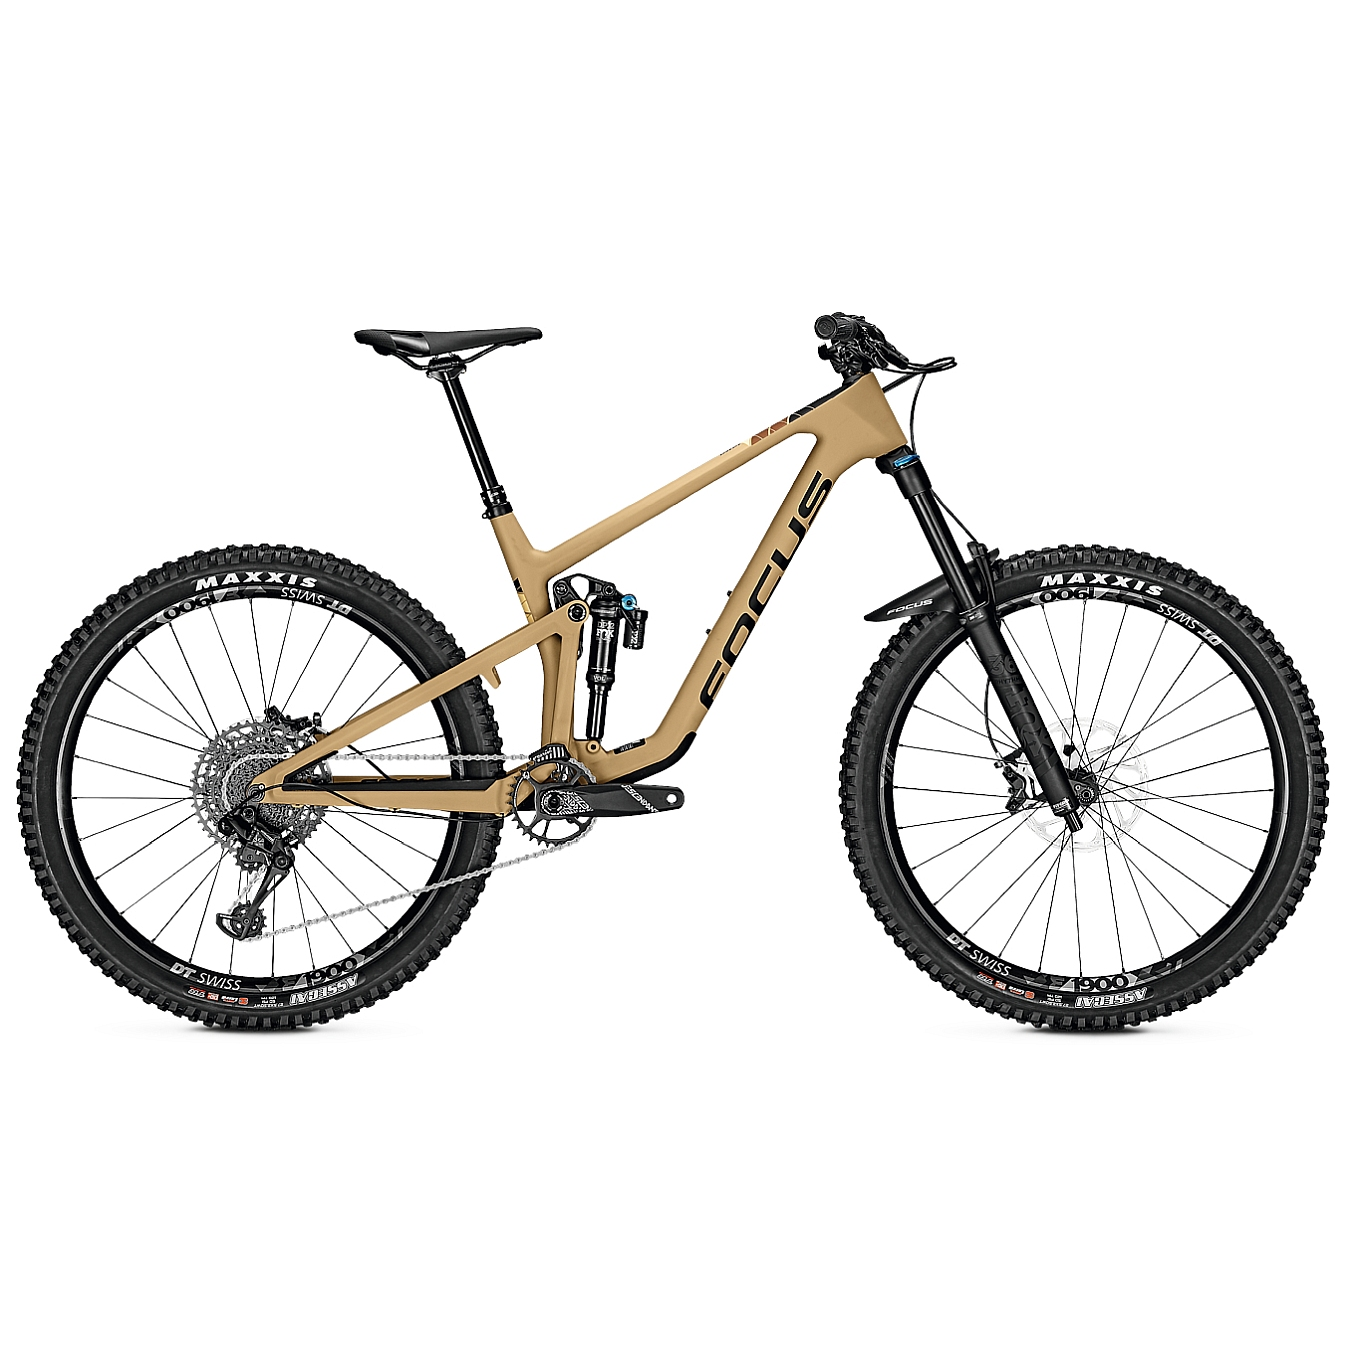 FOCUS SAM 9.9 - 27.5 Inches Carbon Mountainbike - 2022 - Sand Brown Matt